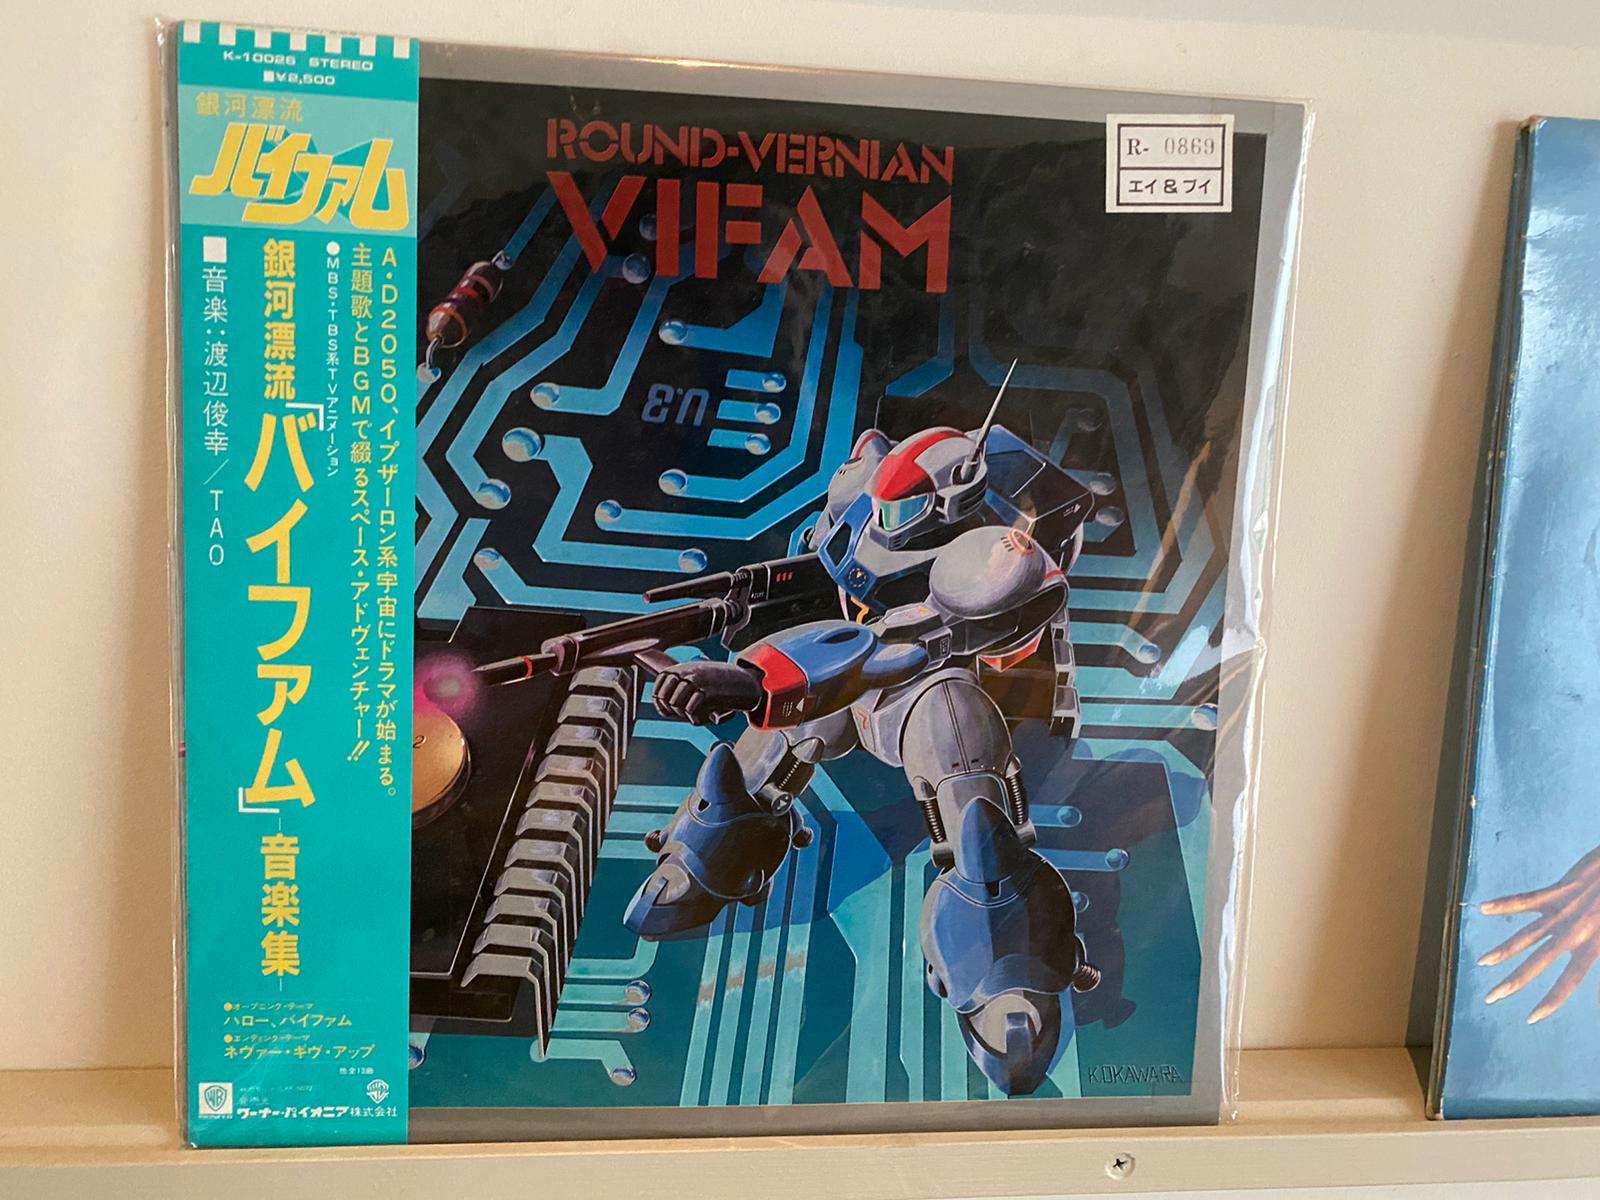 Round-Vernian 'Vifam'